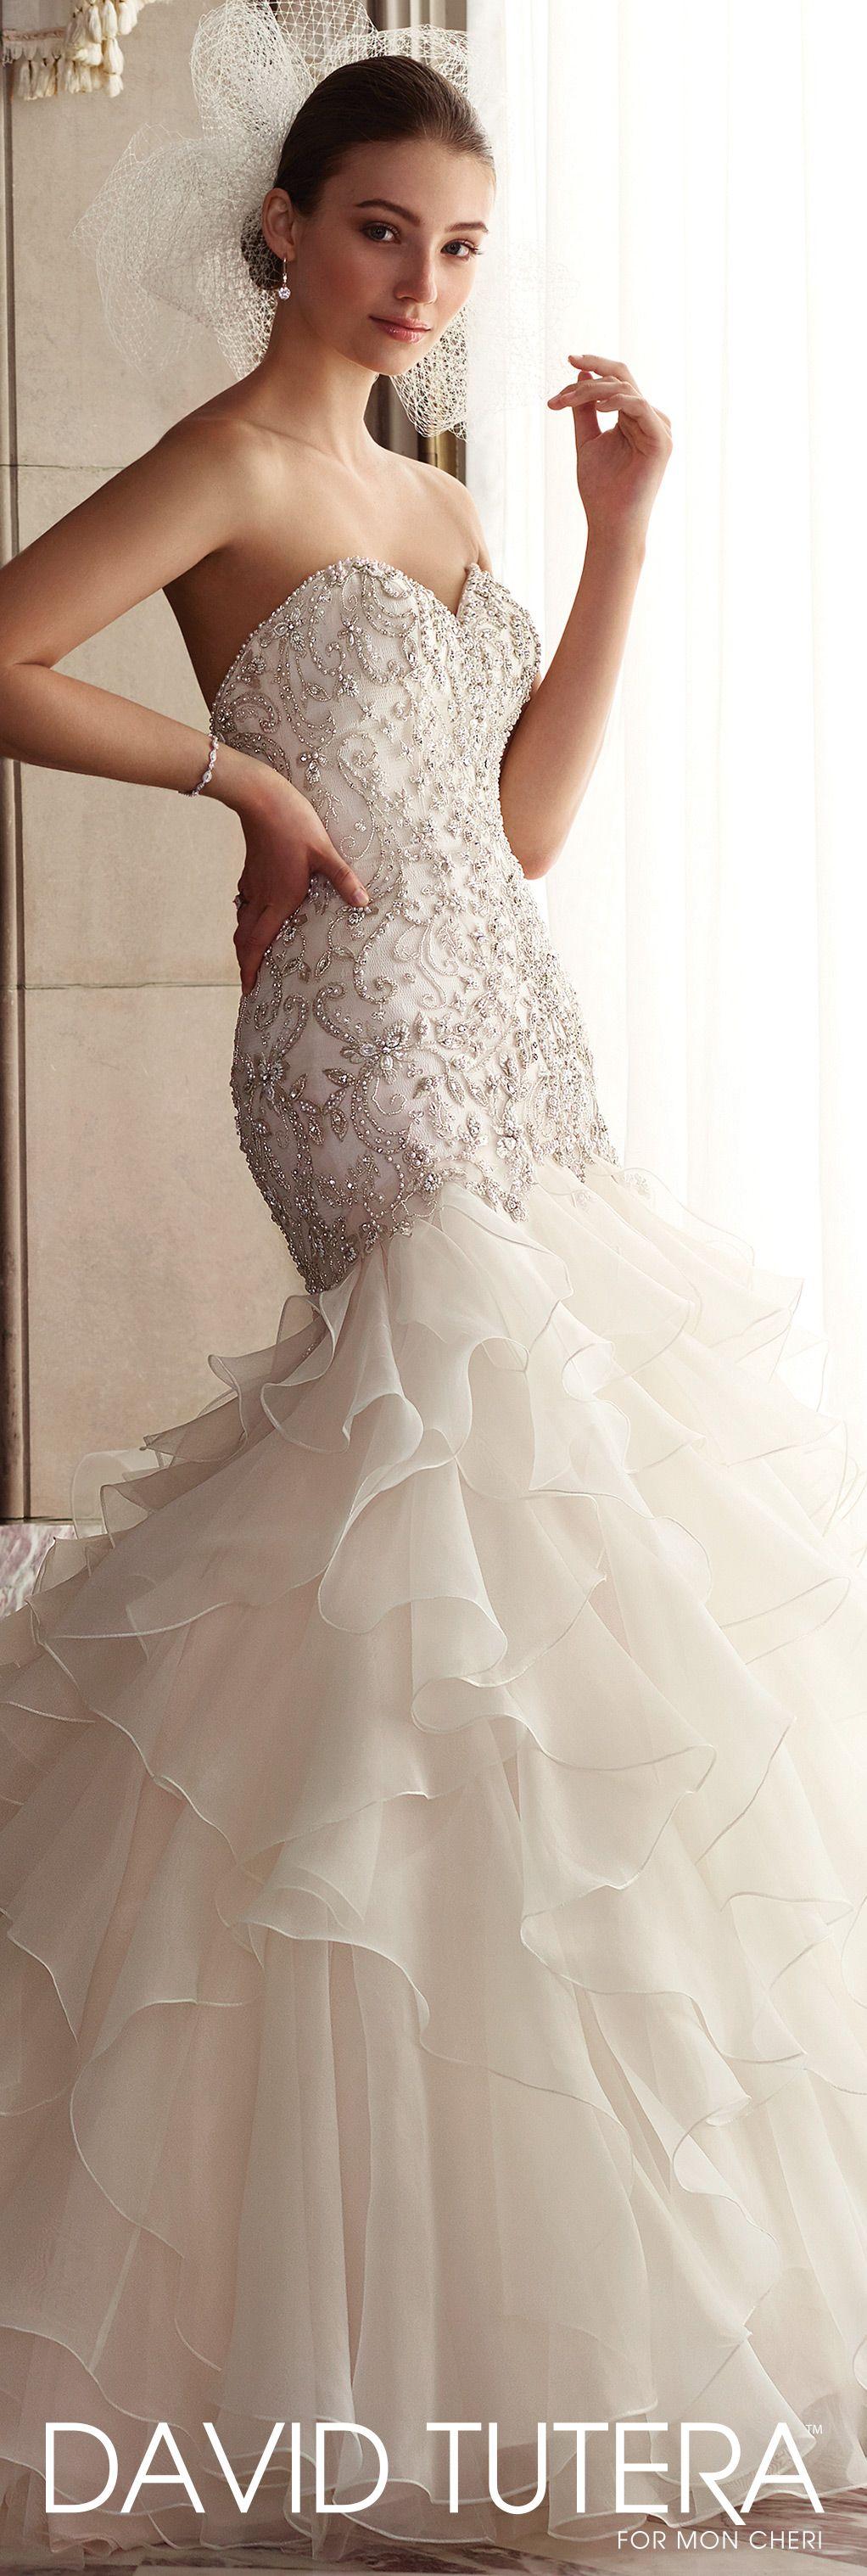 Awesome Dramatic Strapless Ruffled u Tiered Trumpet Wedding Dress Dior